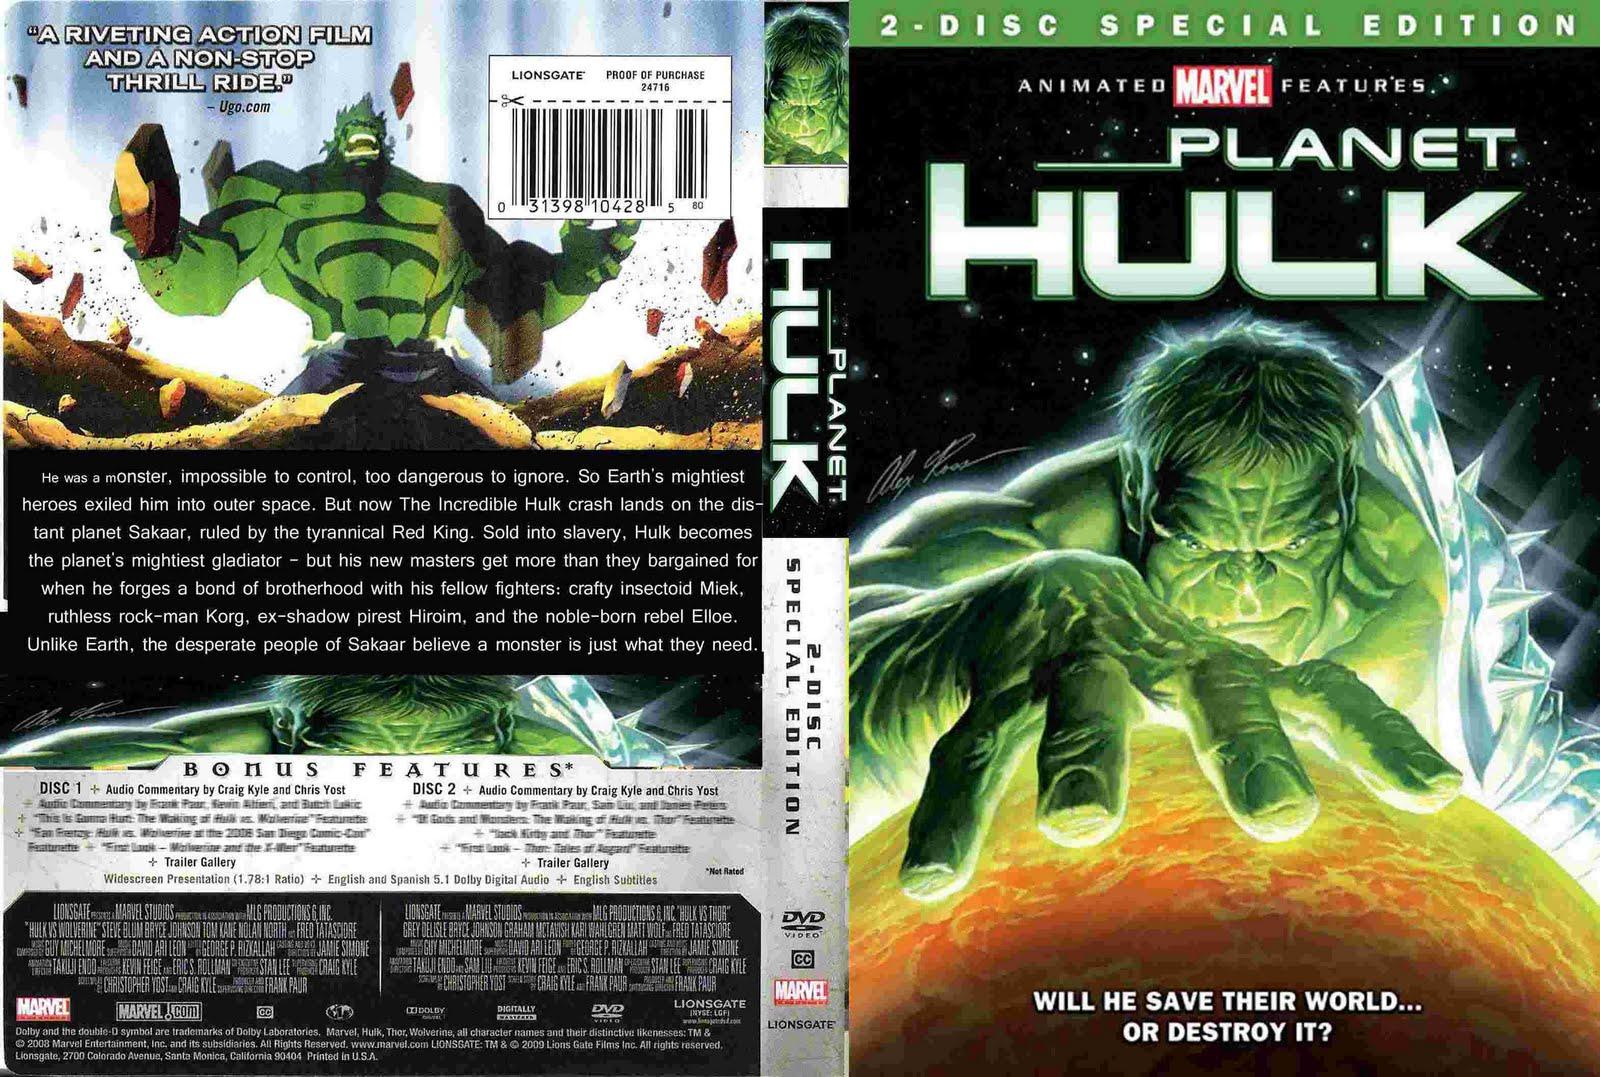 Animation Movie Planet Hulk 2010 Kazirhut Com Popular Bangla